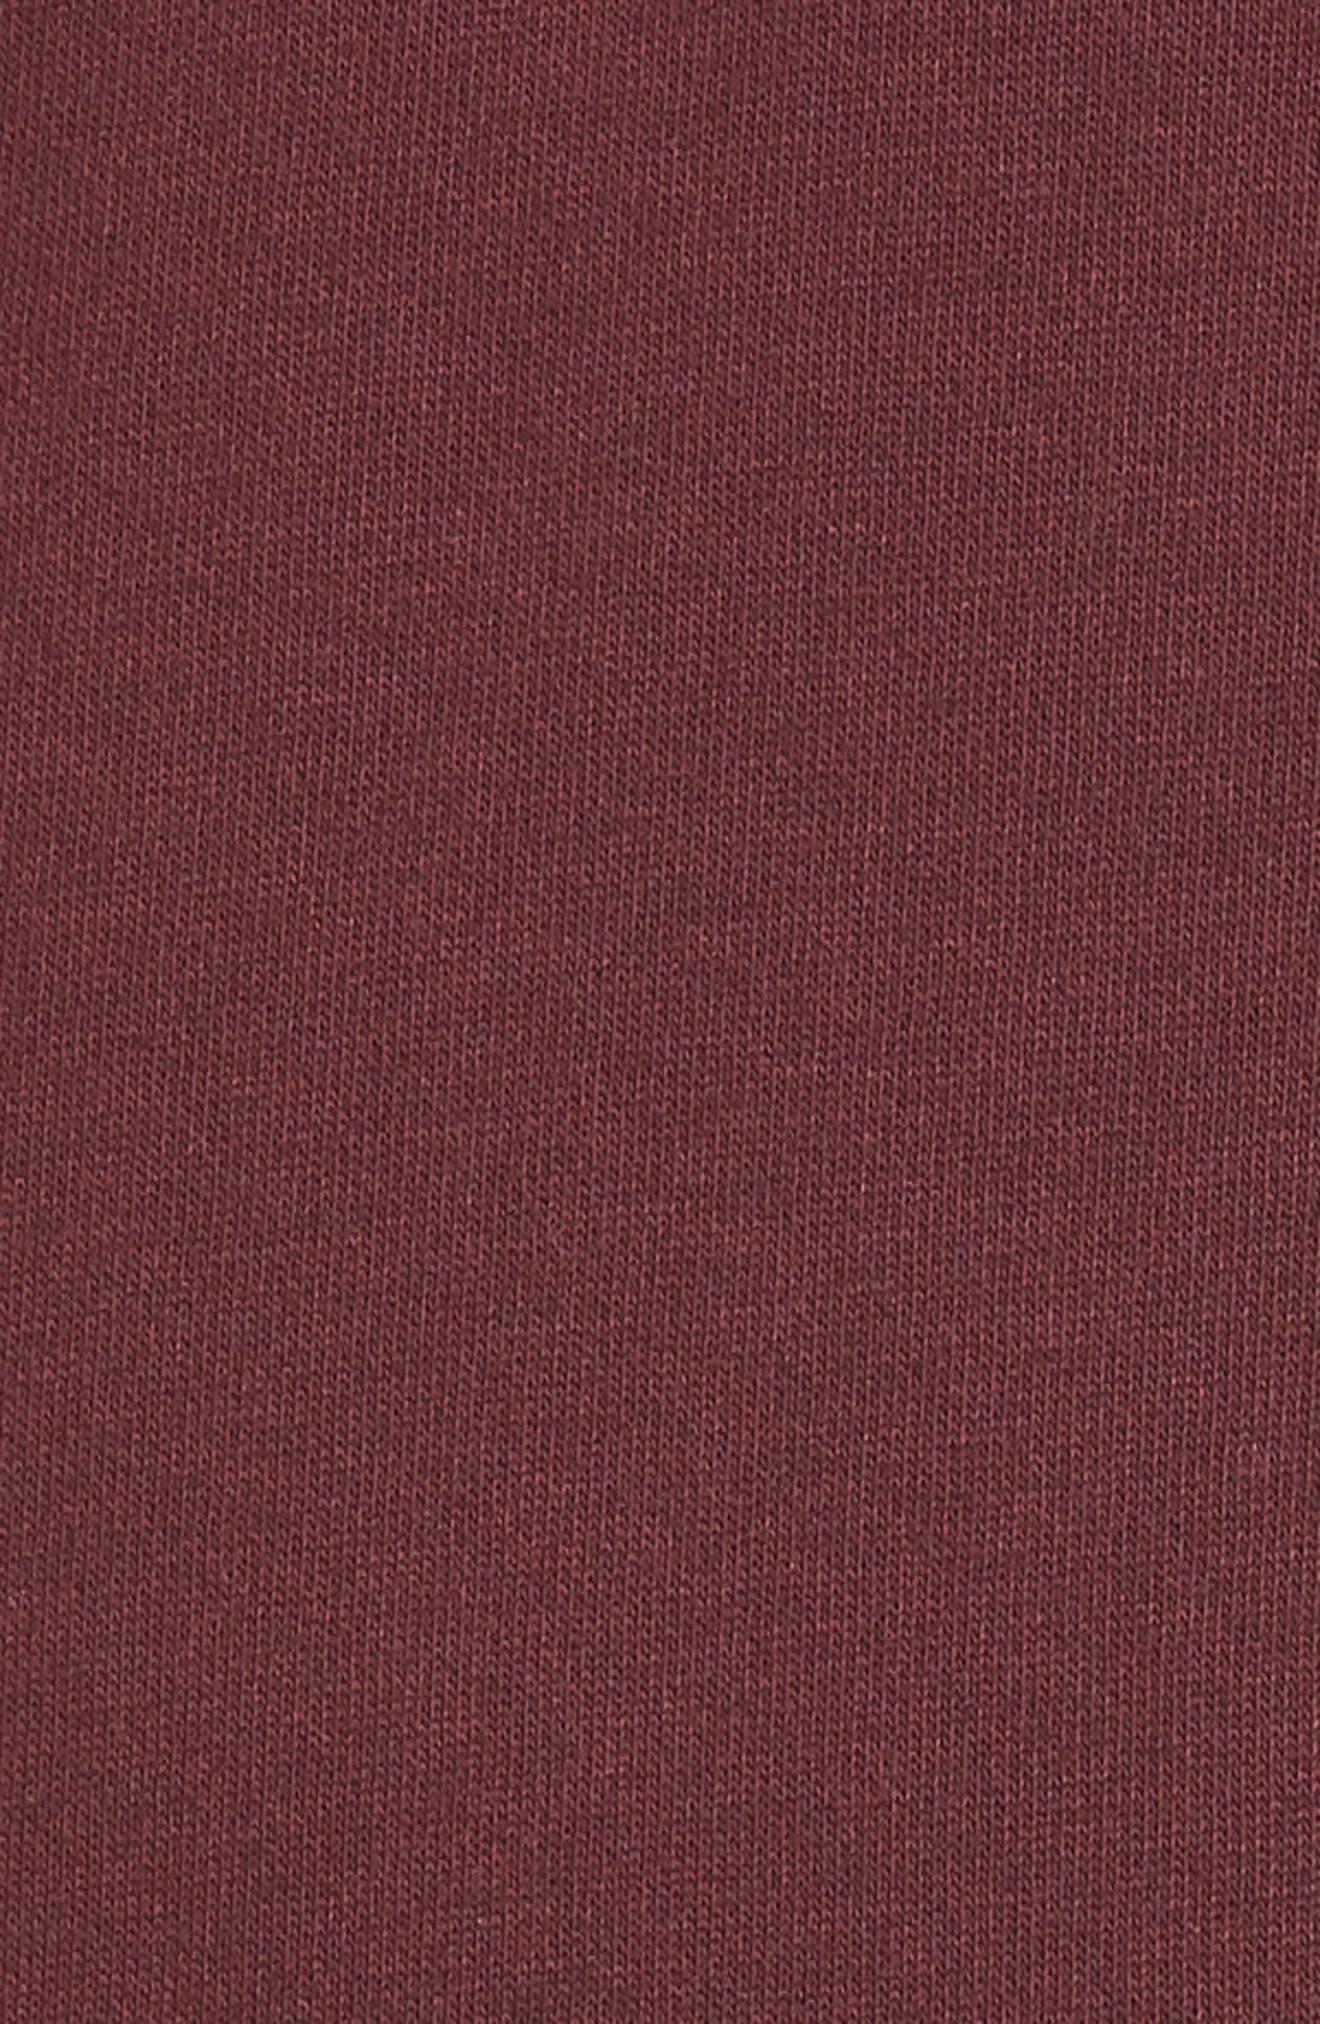 OG Oval Hoodie,                             Alternate thumbnail 5, color,                             930